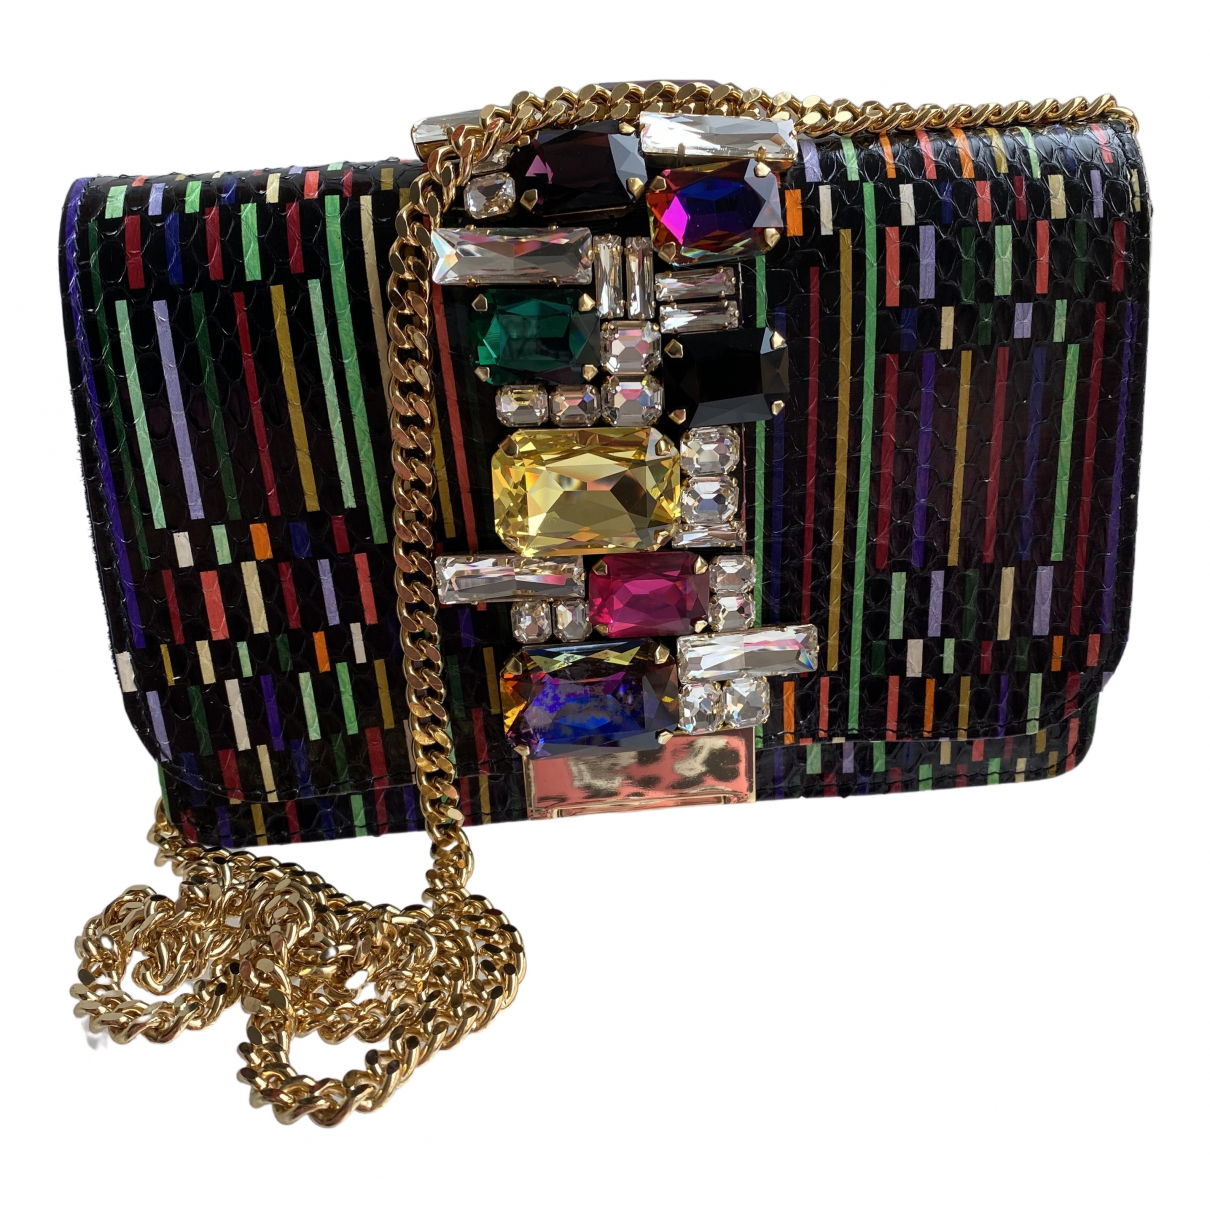 Gedebe N Multicolour Leather Clutch bag for Women N